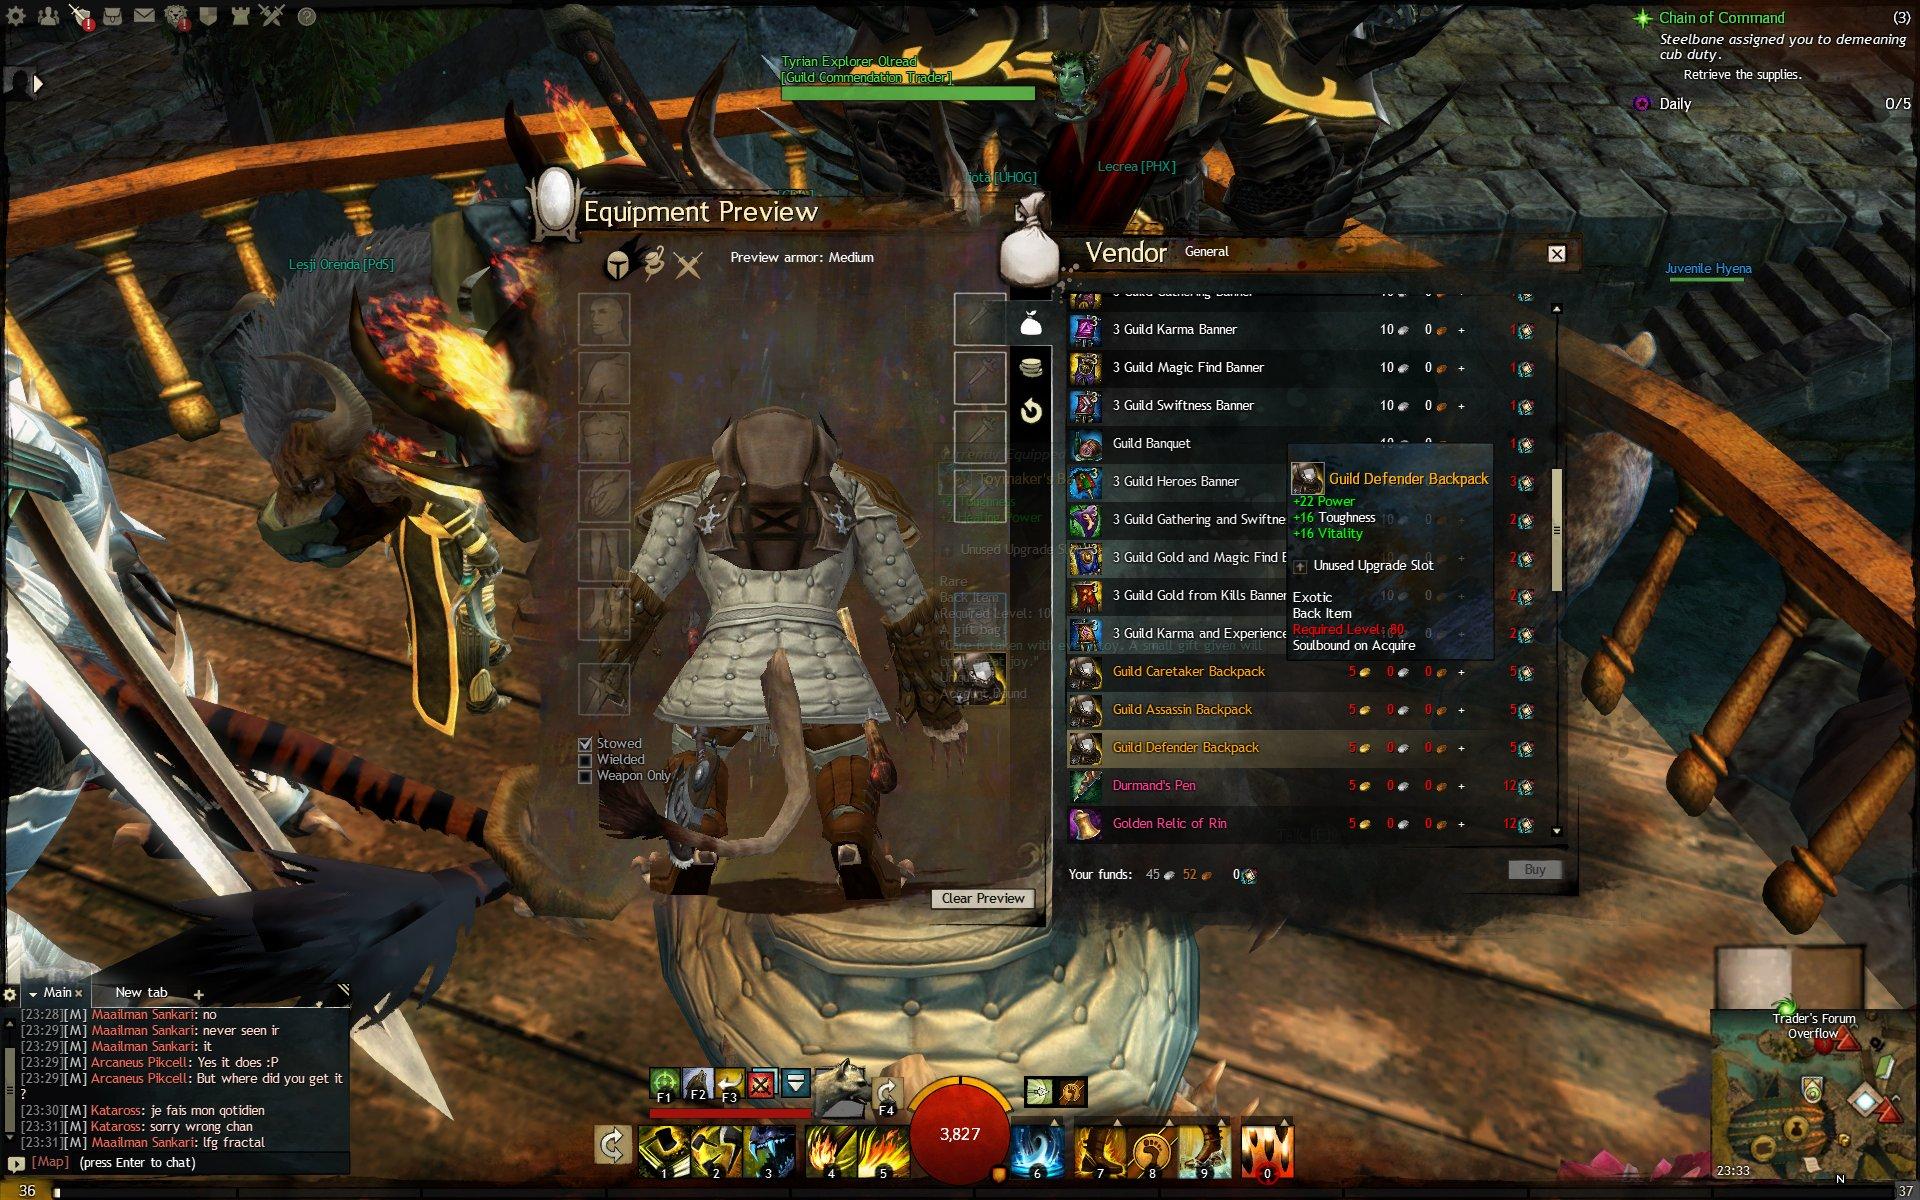 Gw2_2013_02_26_23_33_32_852 - Guild Wars 2 Life